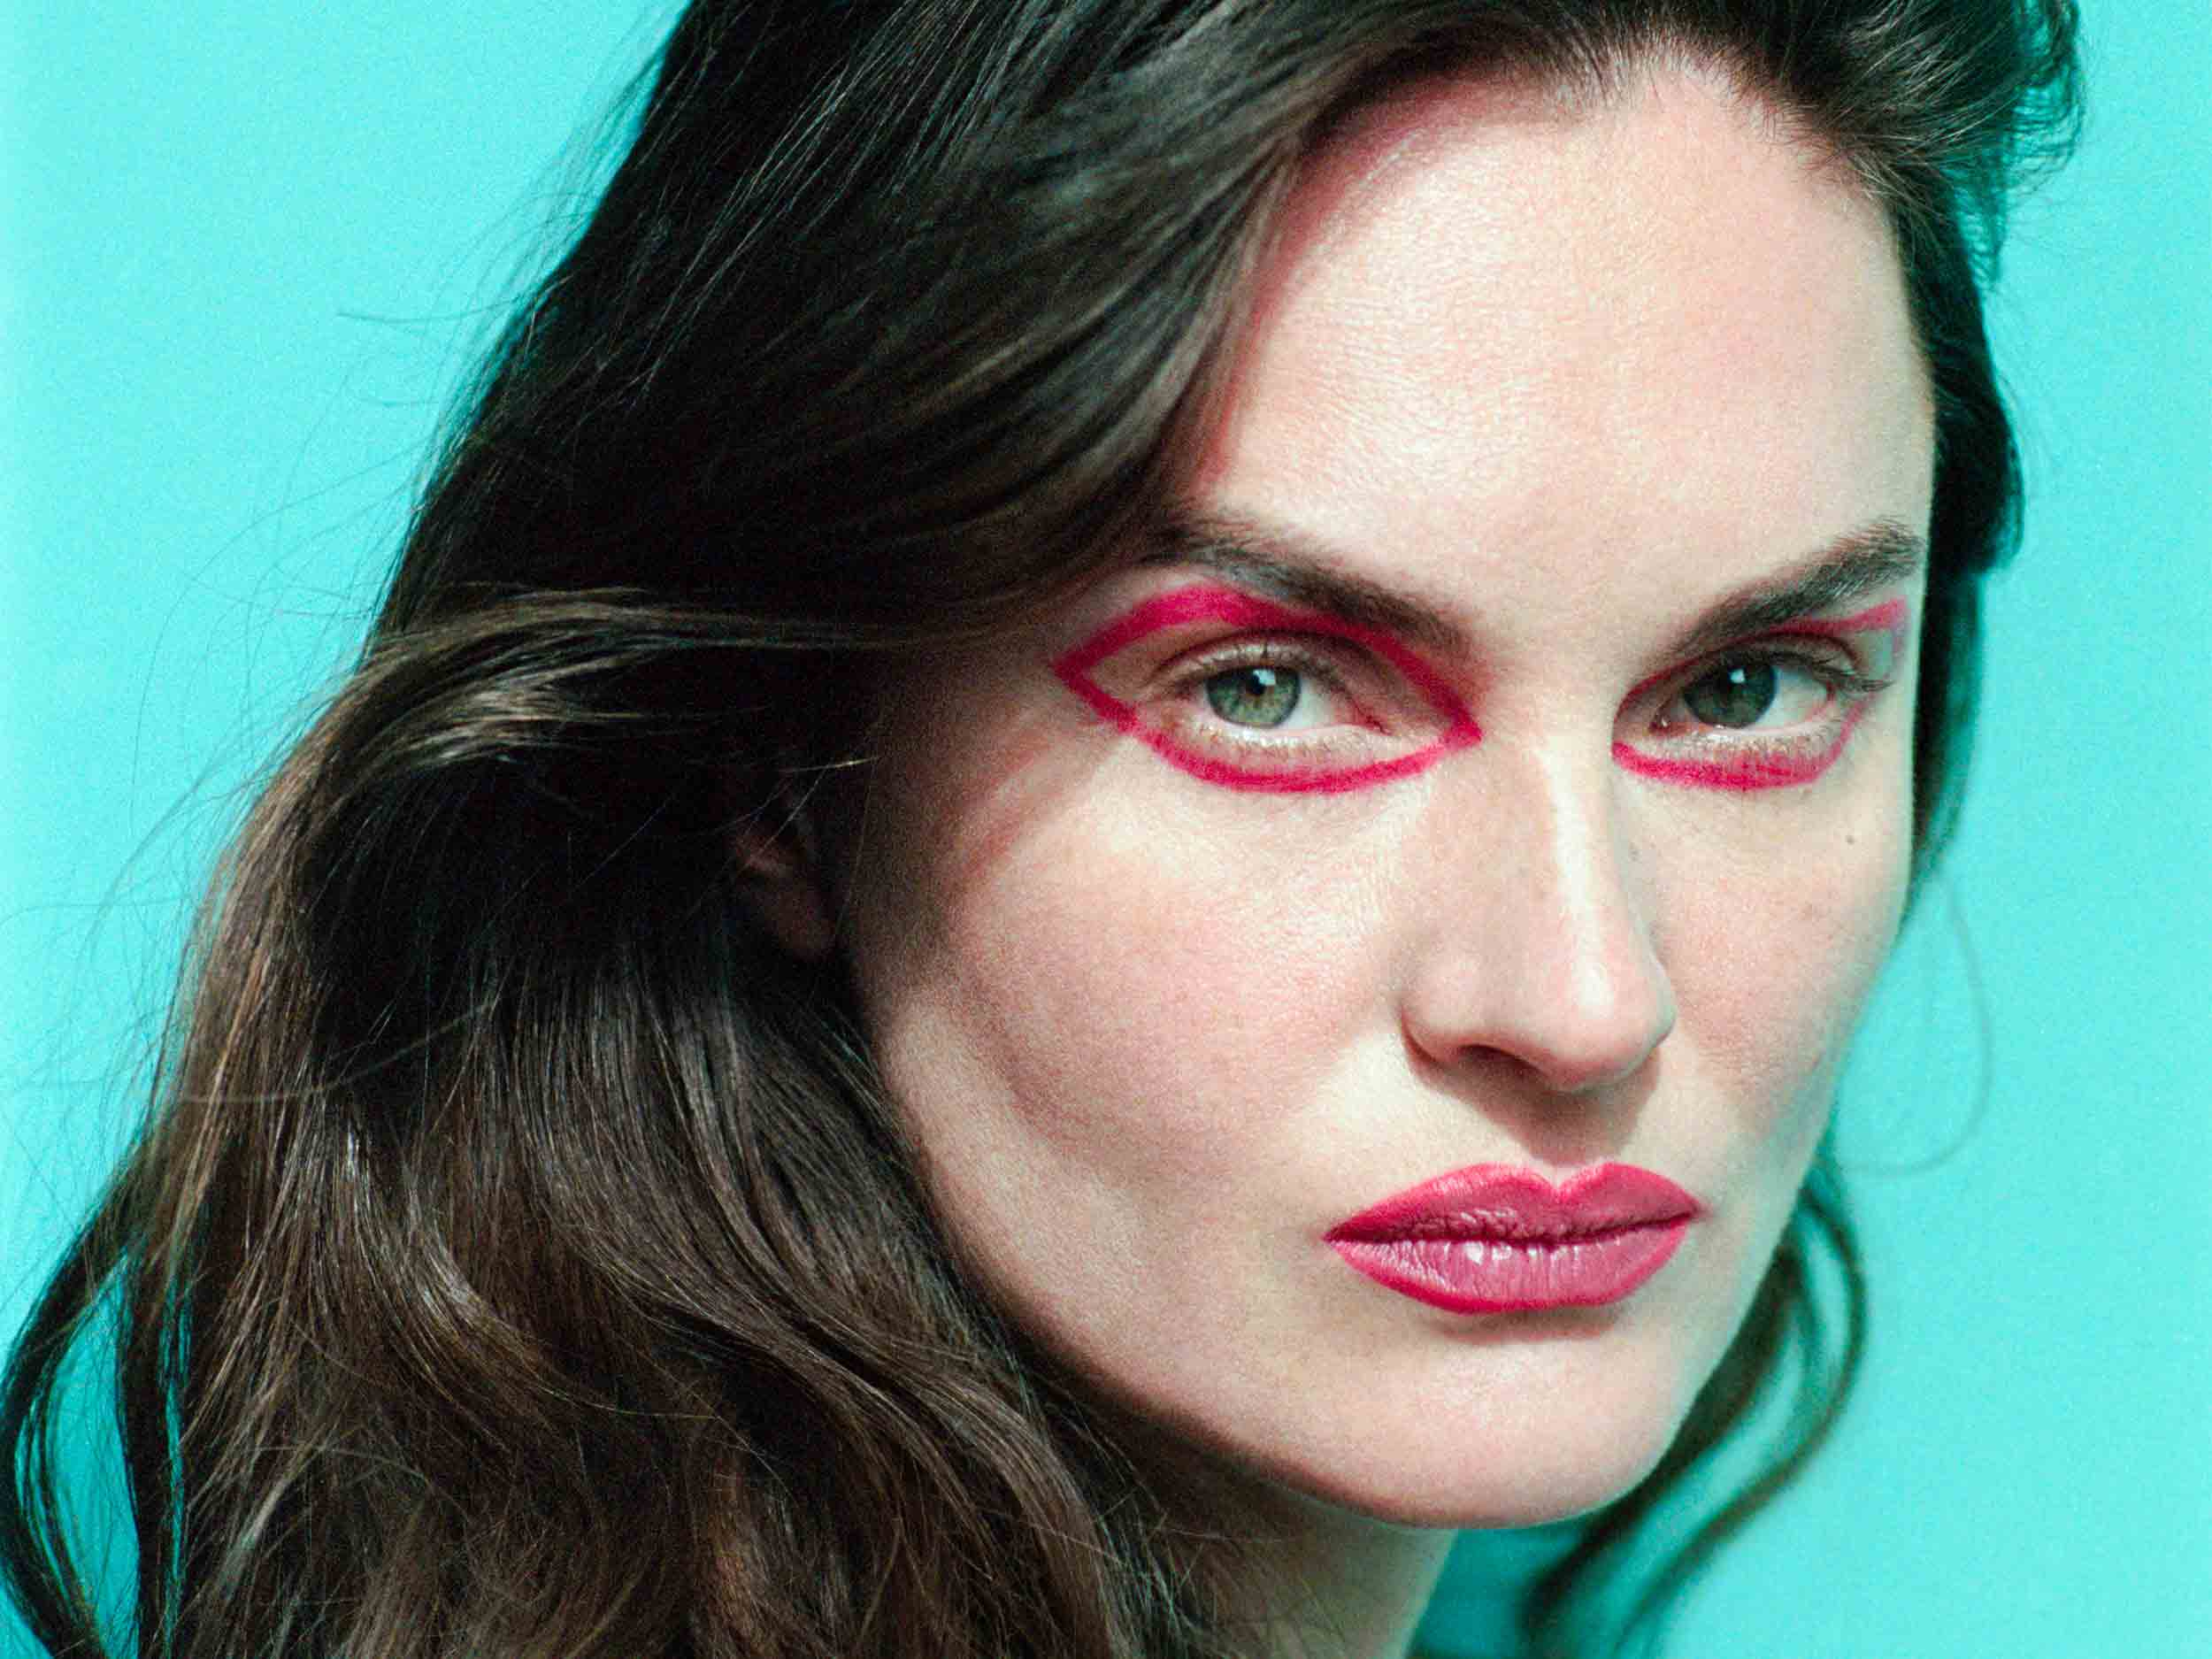 The world through rose-tinted eyeliner